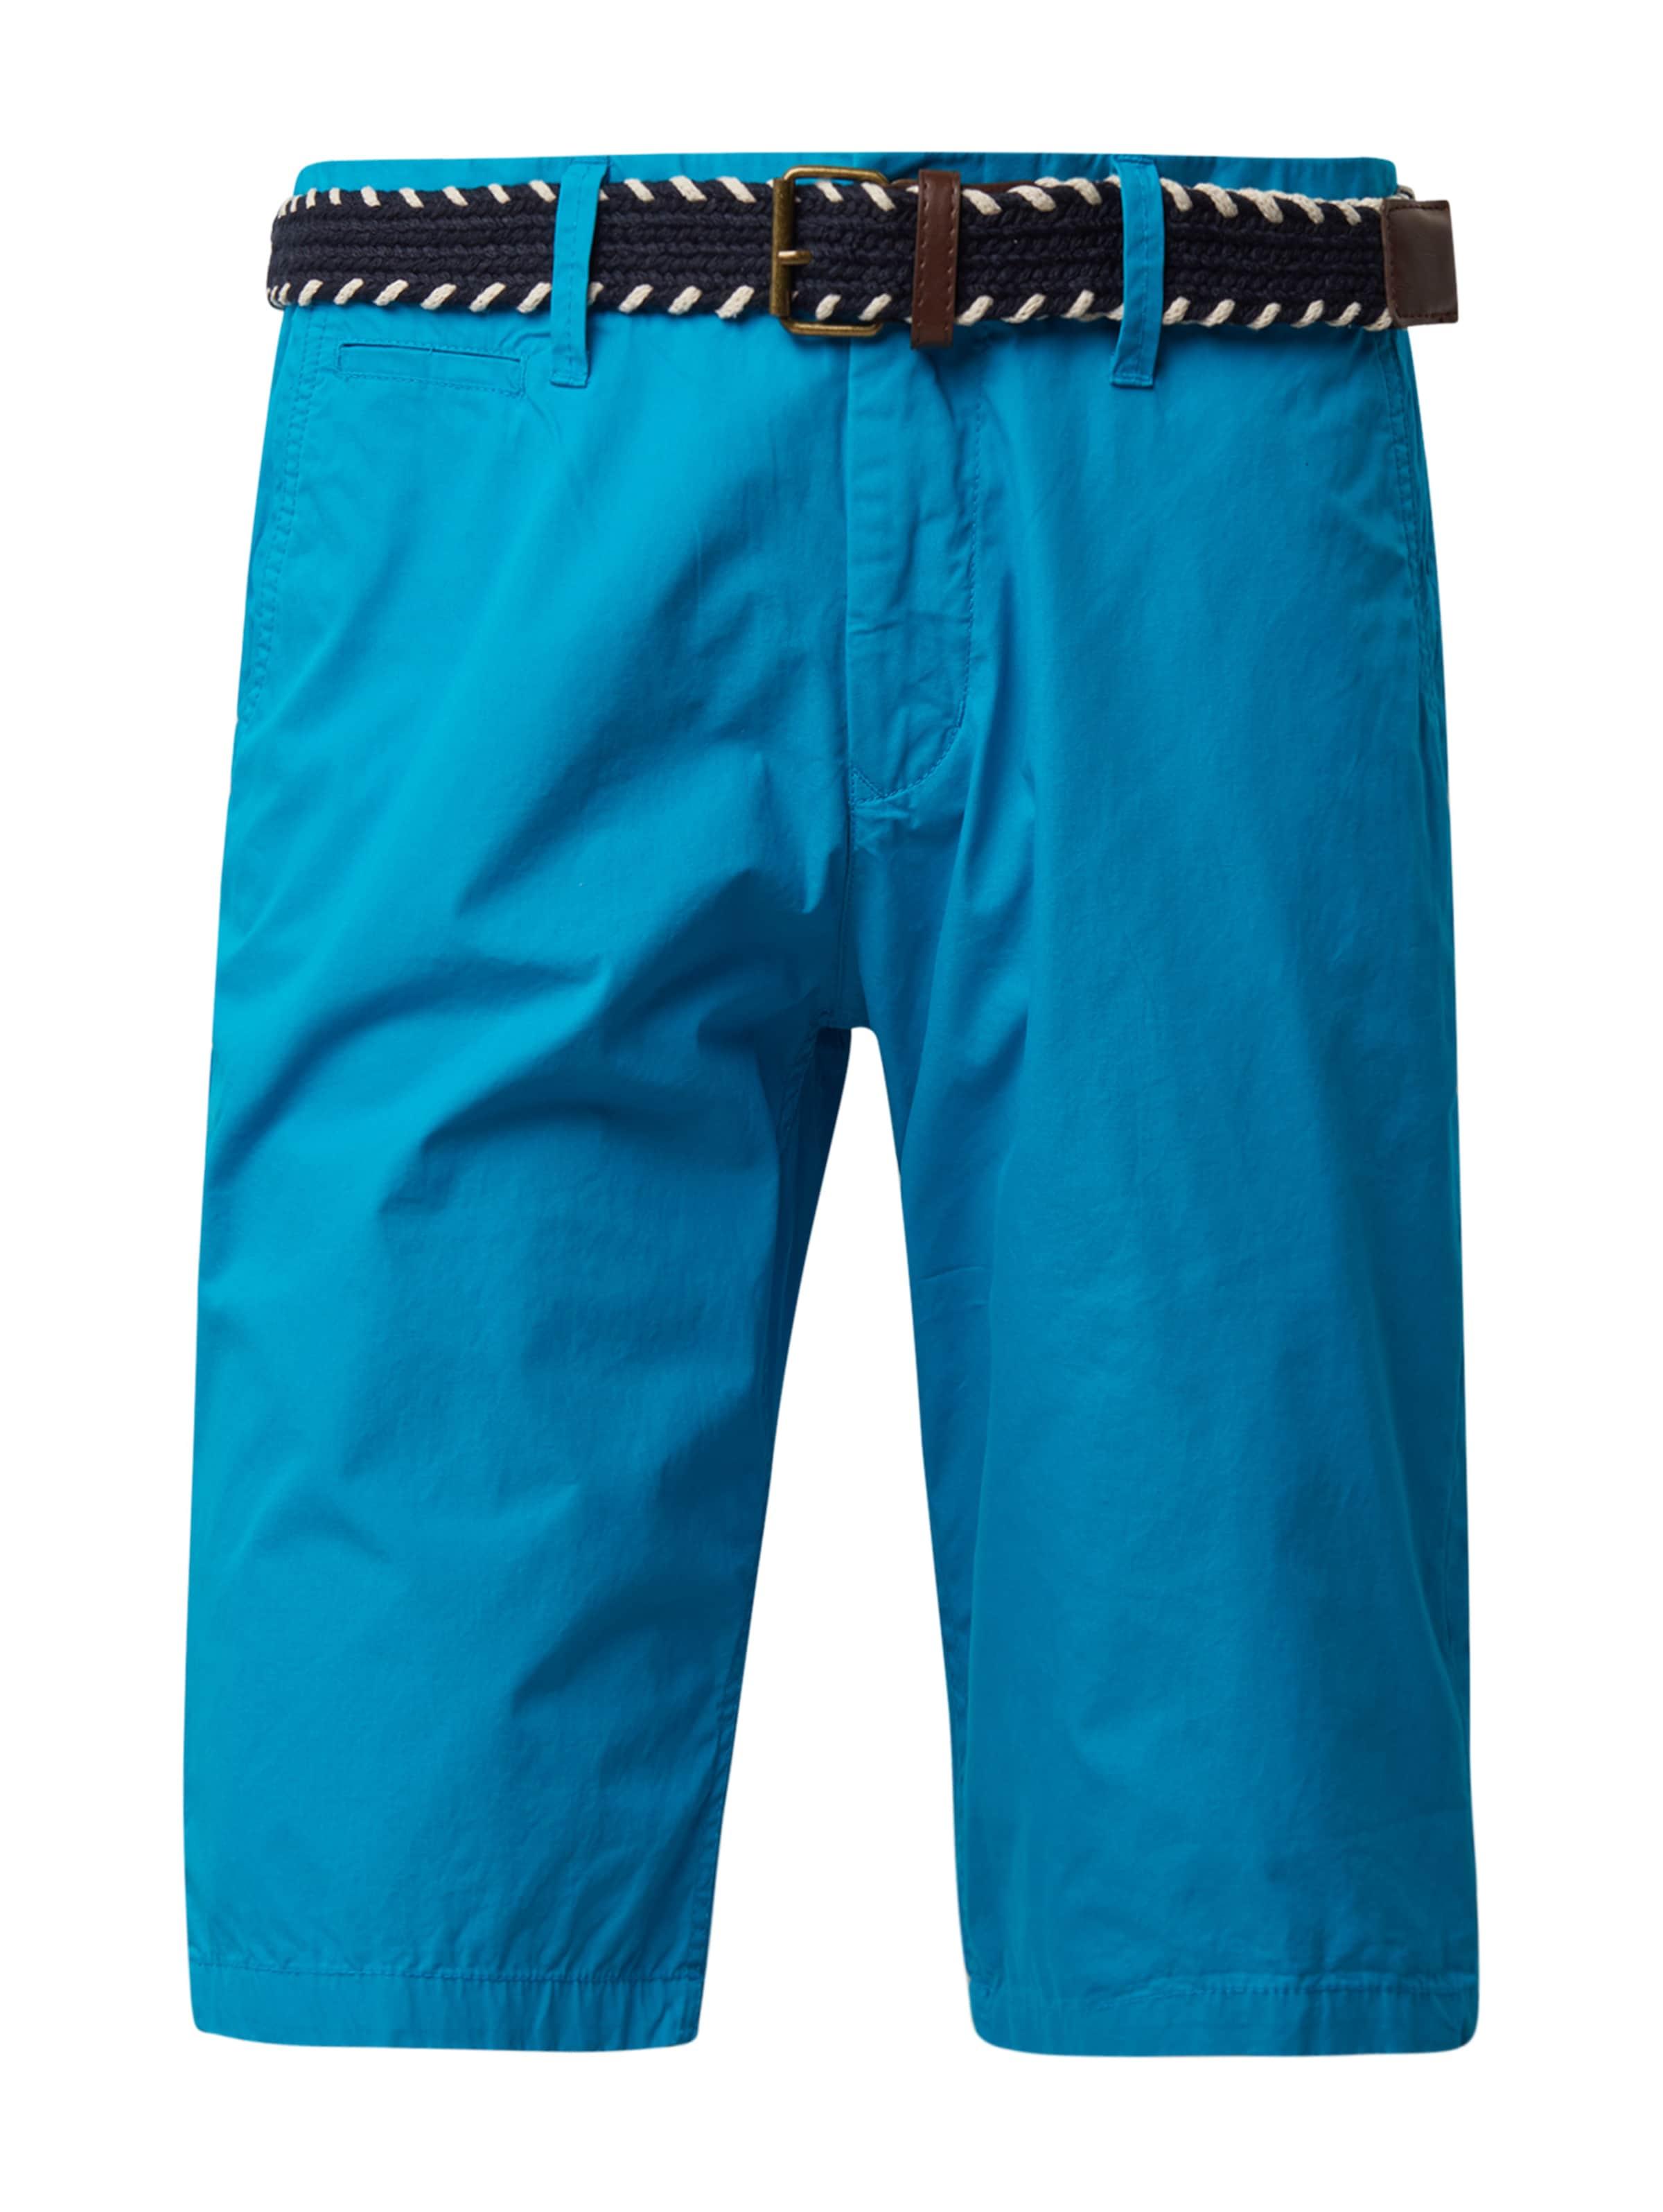 Royalblau Tom Shorts In 'bermuda' Tailor N0PZ8nOwXk